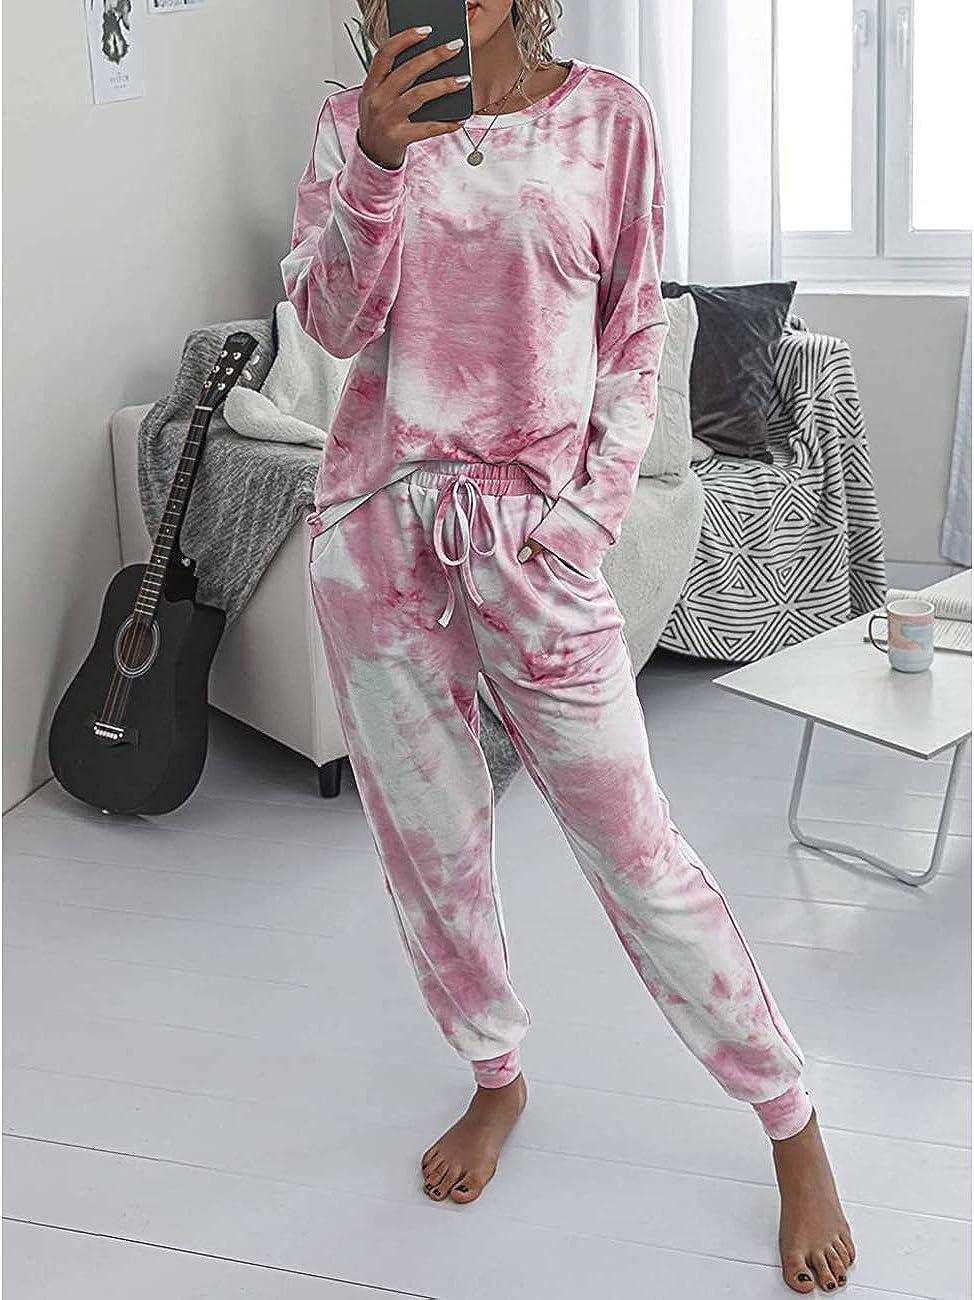 MEROKEETY Womens Tie Dye Print Pajama Sets Short Sleeve Tee and Shorts Loungewear Sleepwear